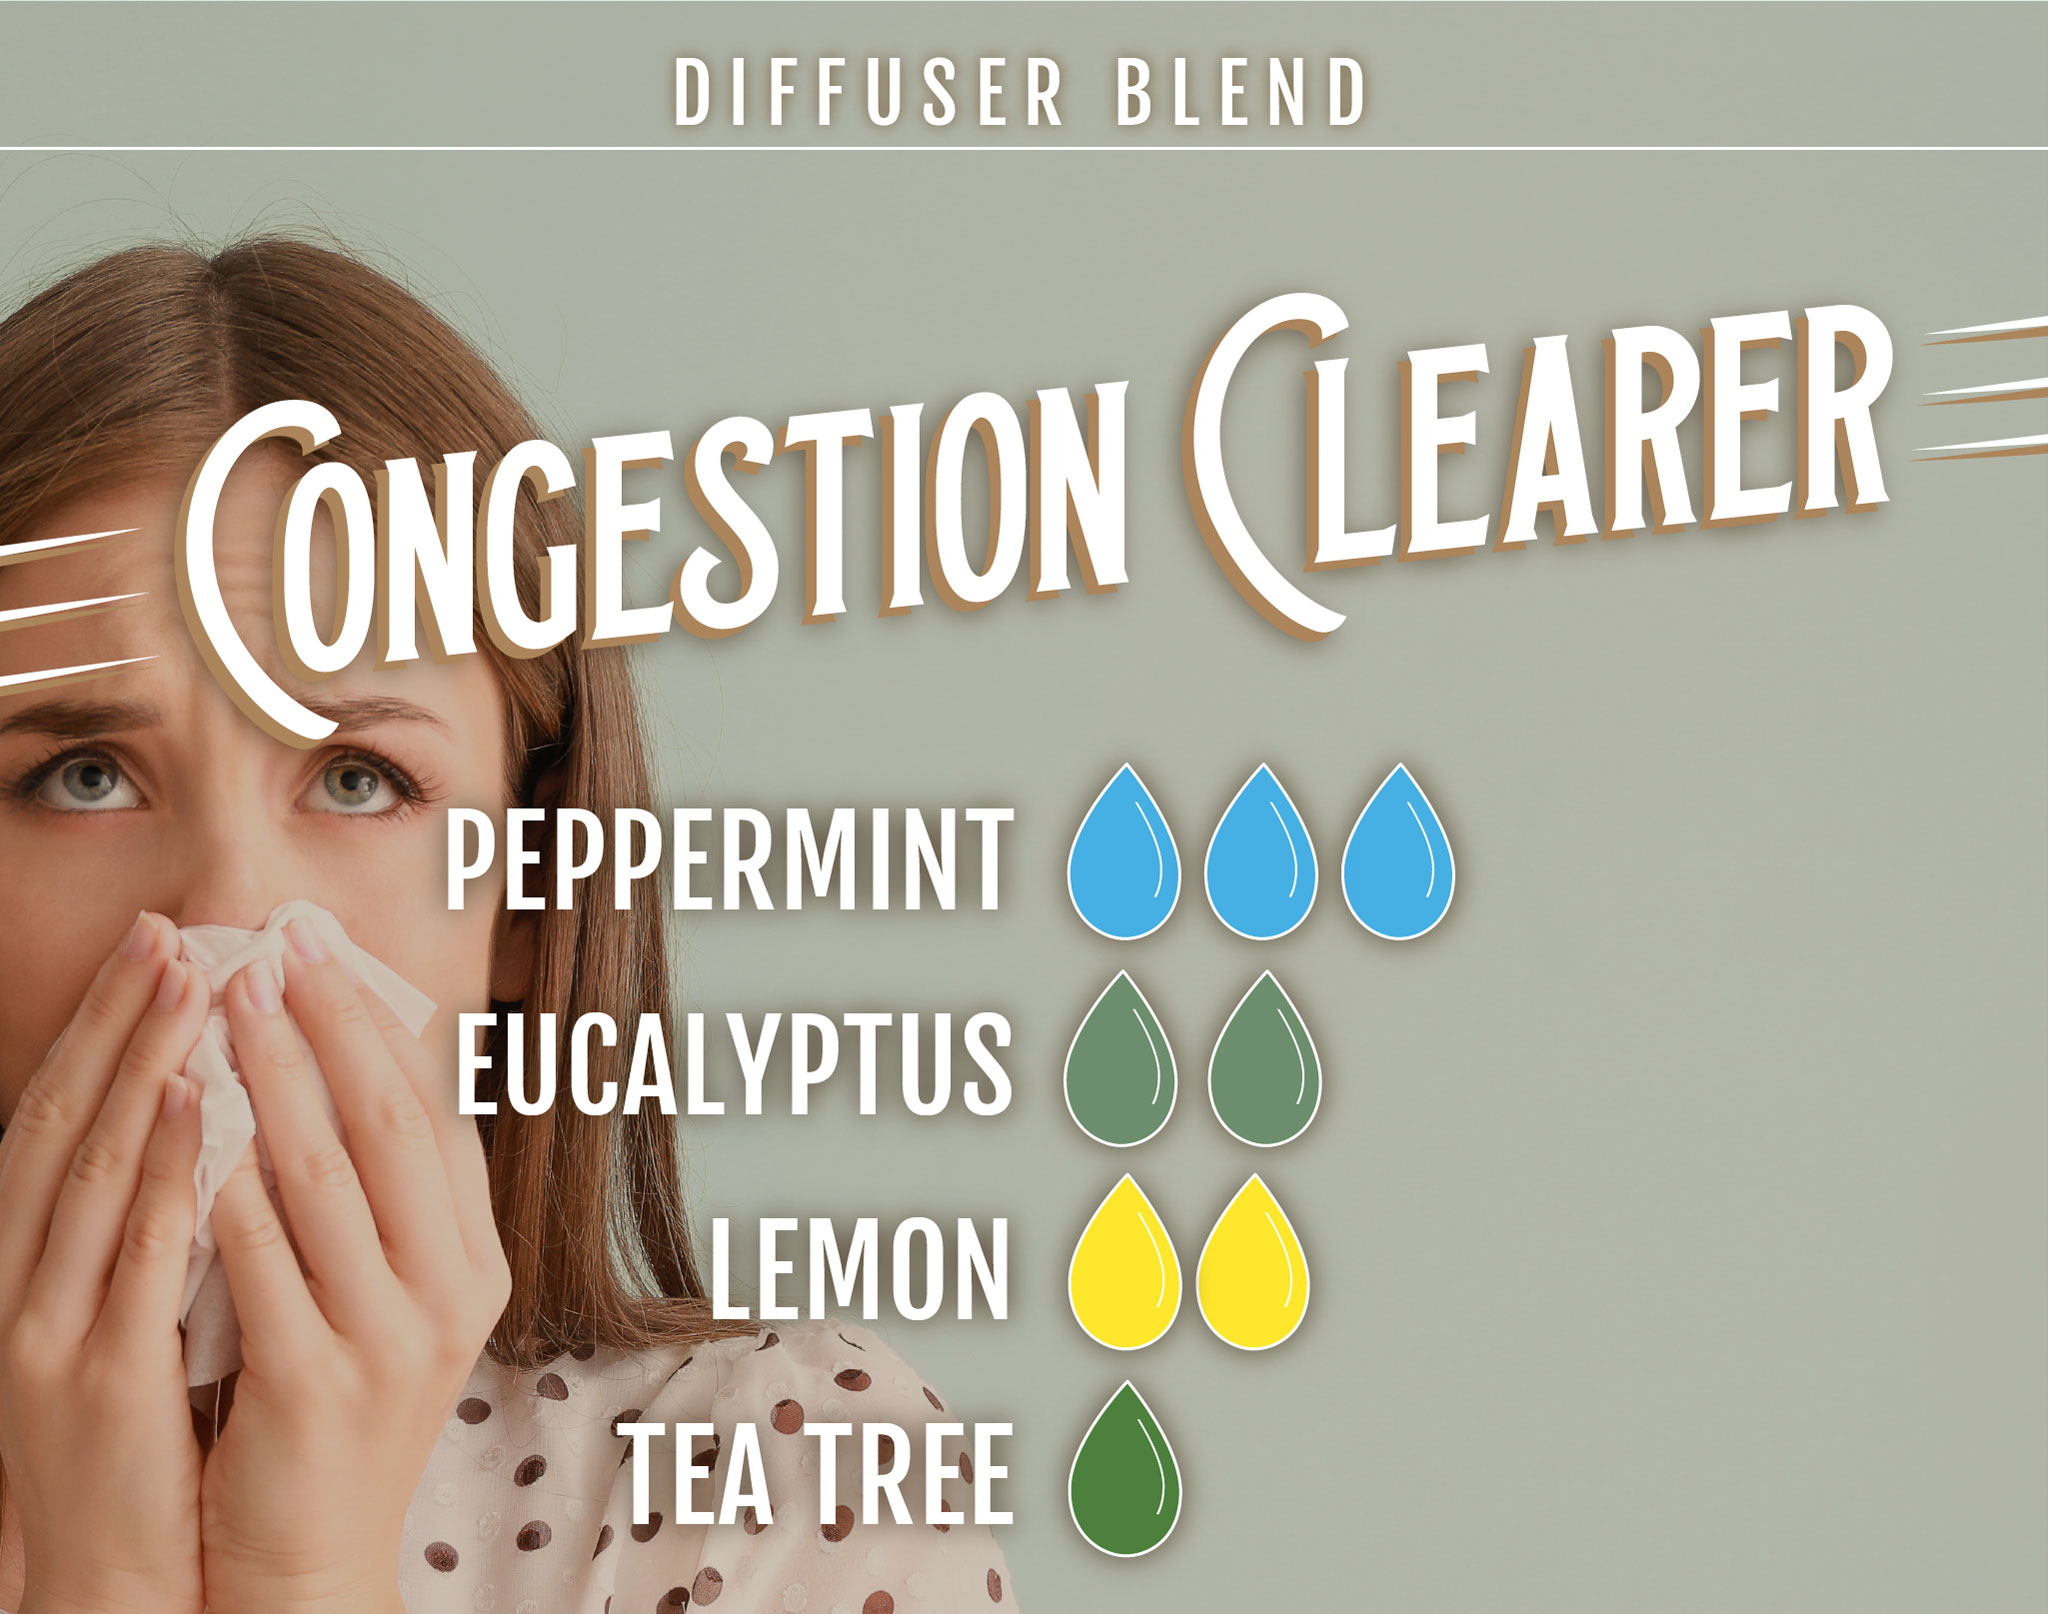 Congestion Clearer Essential Oil (EO) Diffuser Blend: 3 drops peppermint EO, 2 drops eucalyptus EO, 2 drops lemon EO, 1 drop tea tree EO